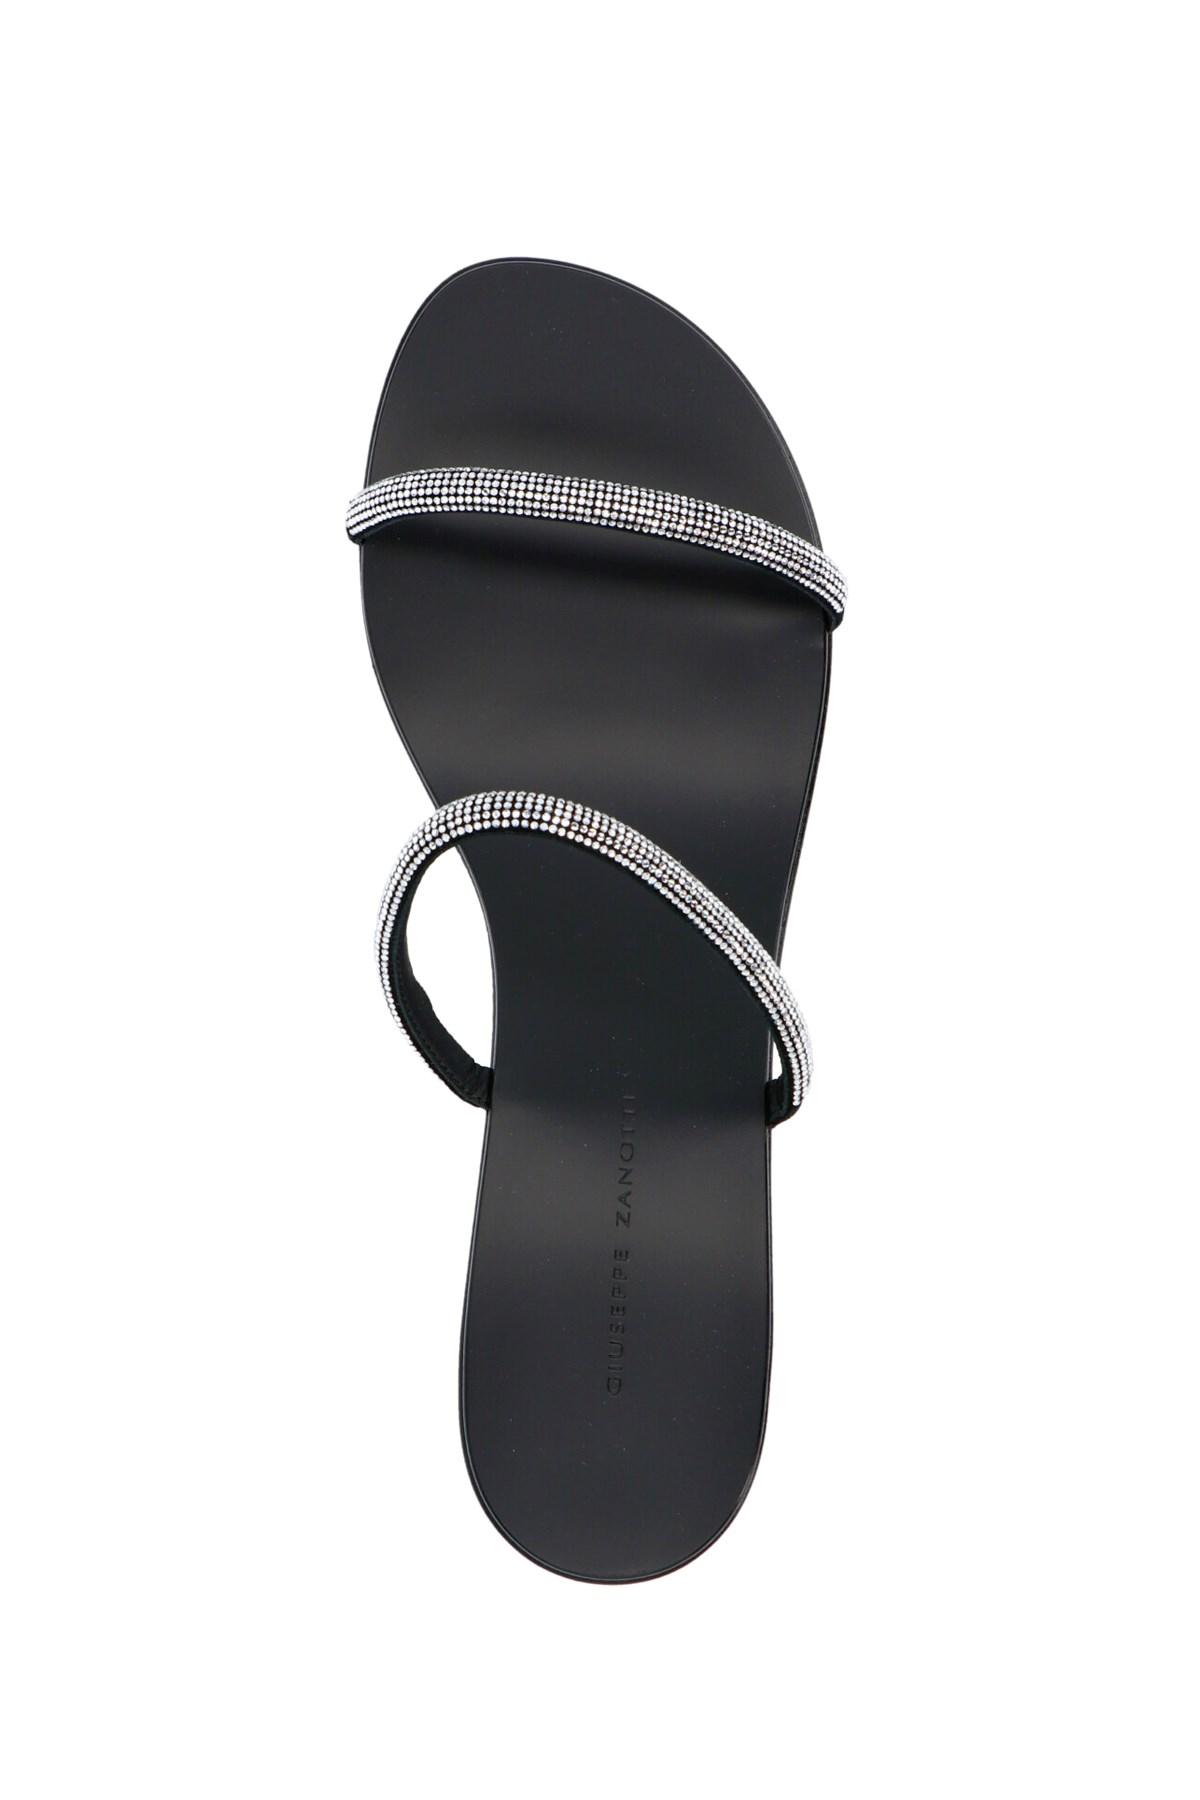 giuseppe zanotti 'Roll' sandals